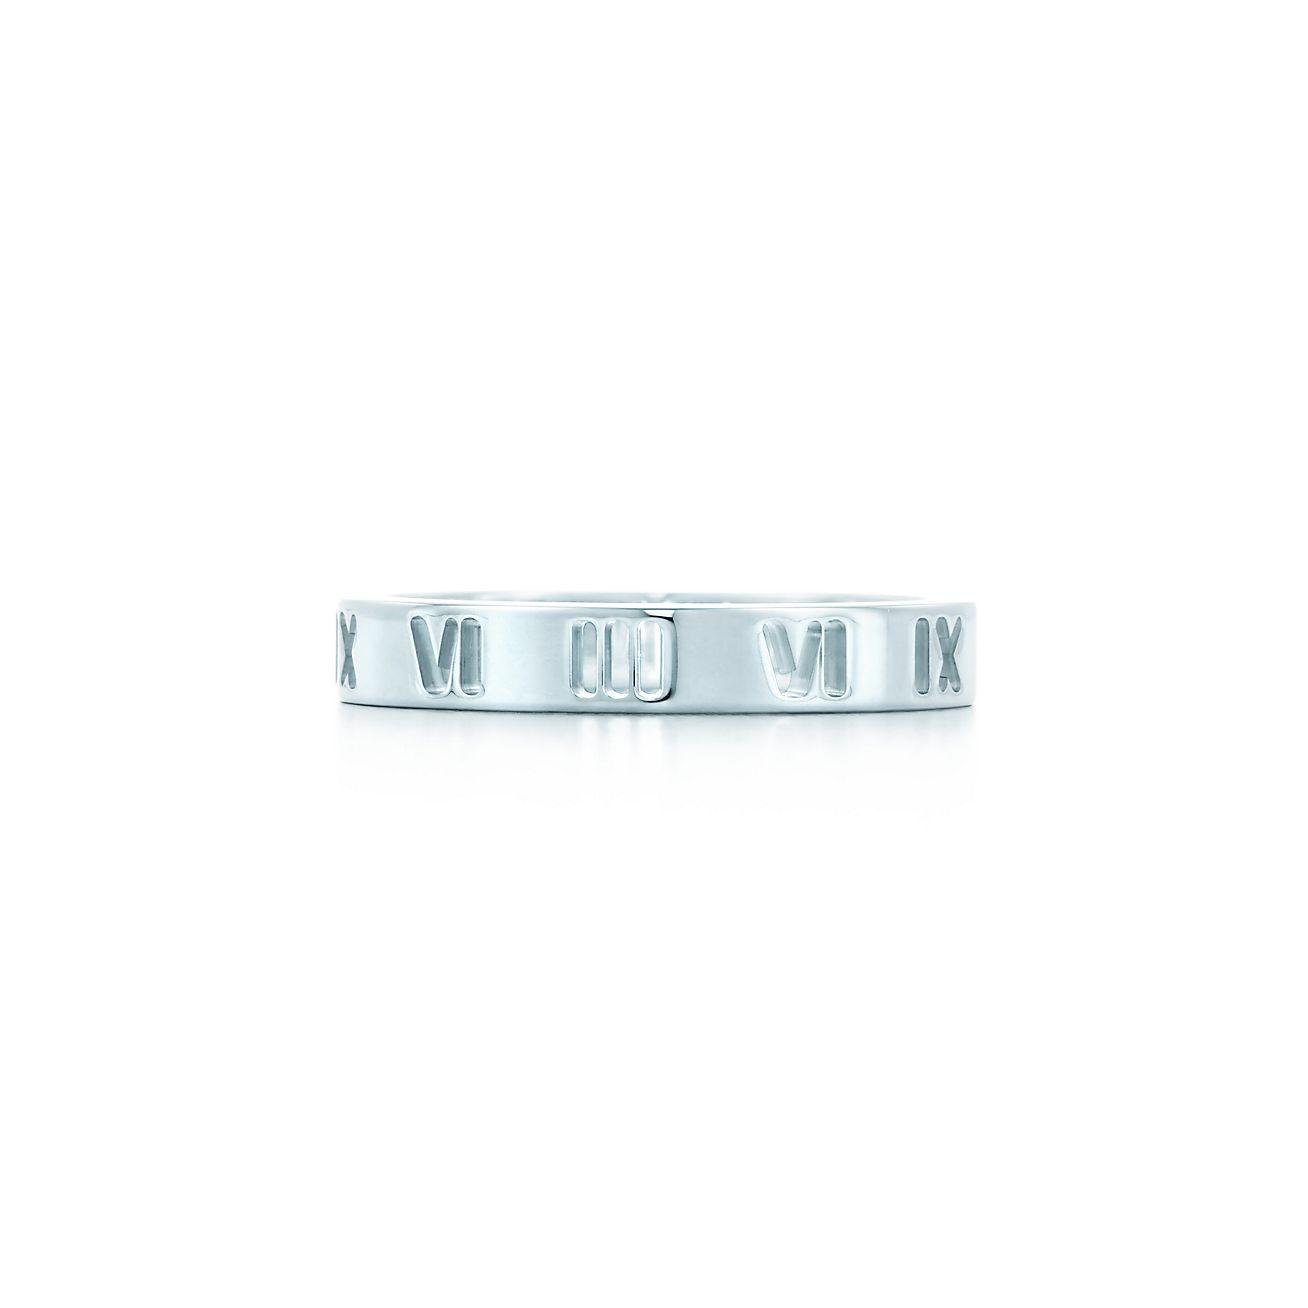 Atlas narrow ring in sterling silver - Size 5 1/2 Tiffany & Co.